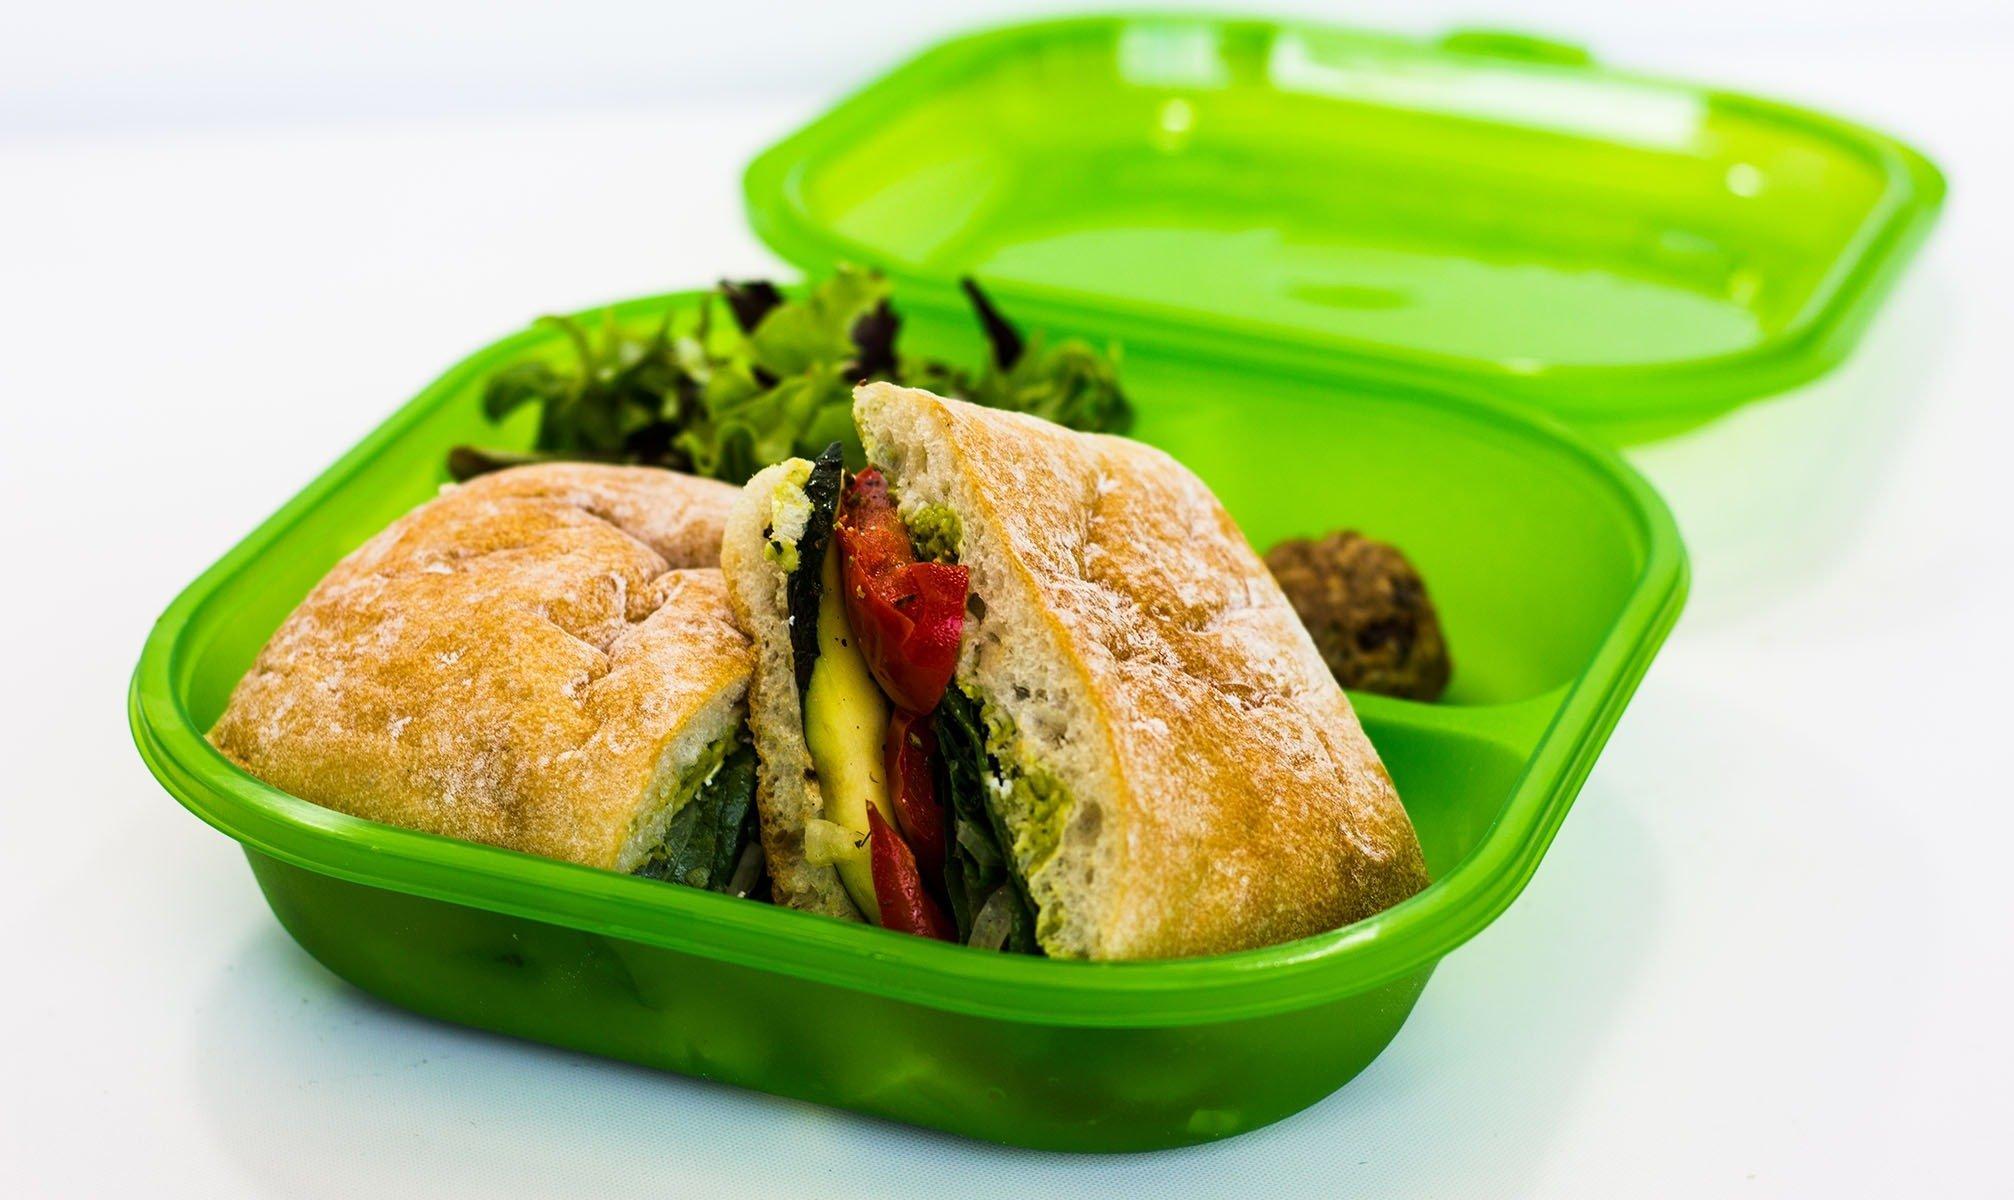 Bevegity Sandwich